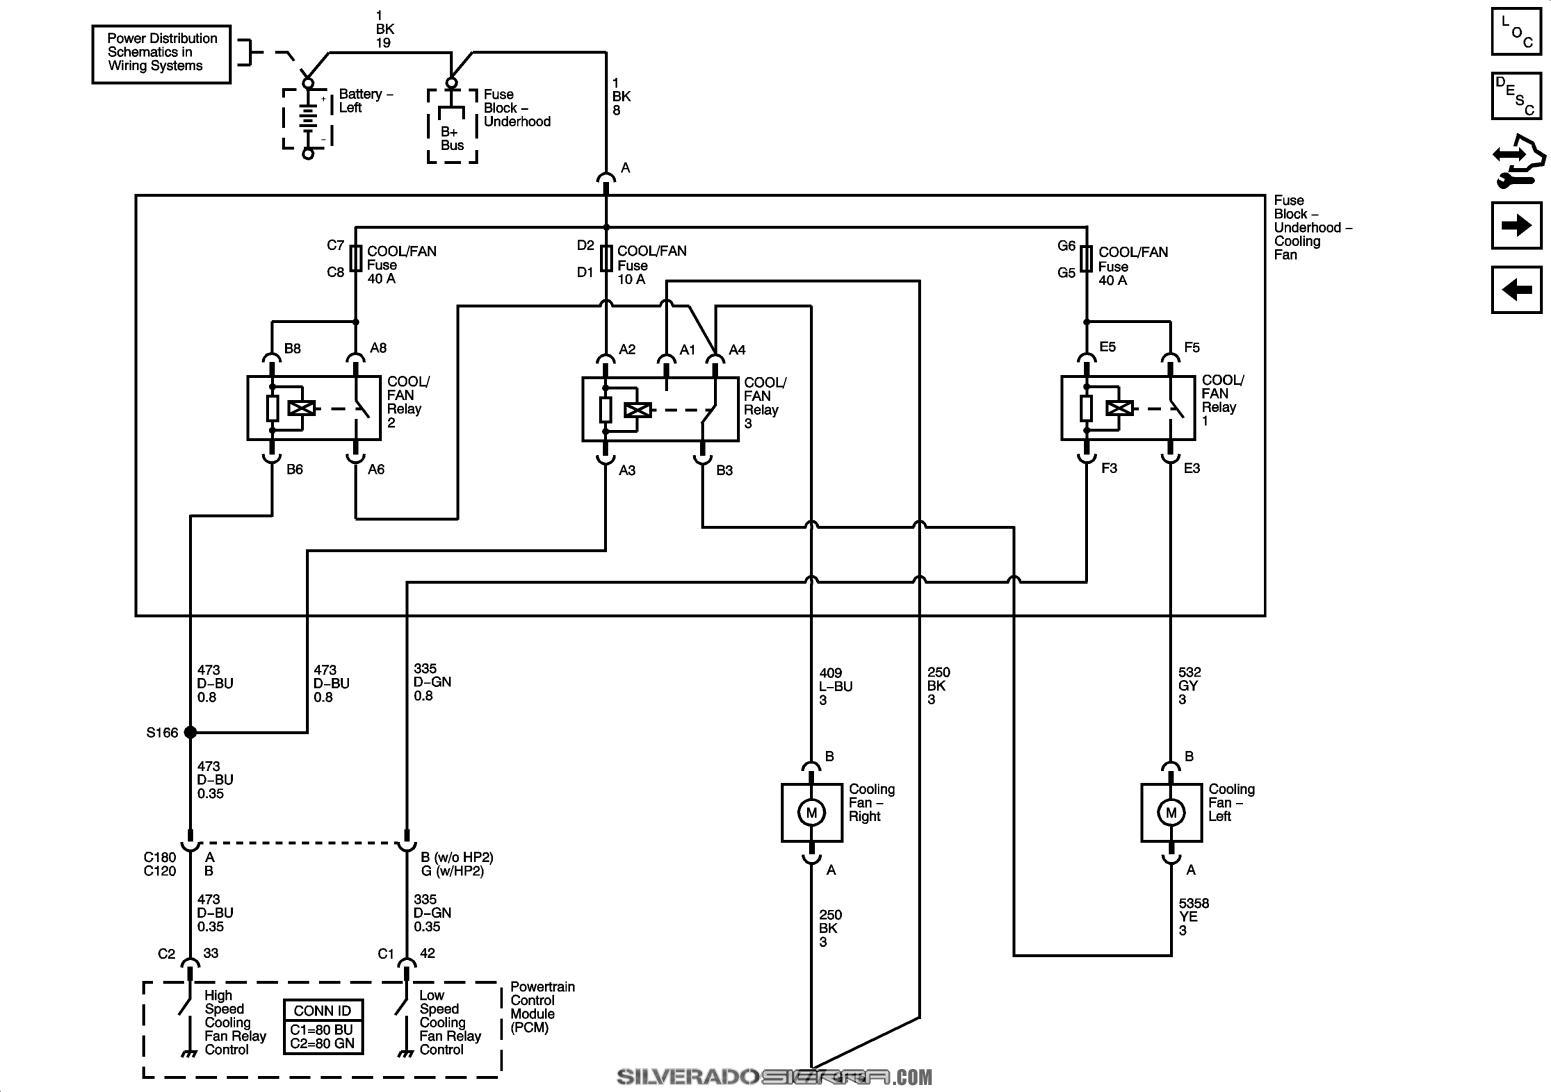 Zb 6972 2011 Chevy Silverado Cooling Fan Wiring Diagram Wiring Diagram